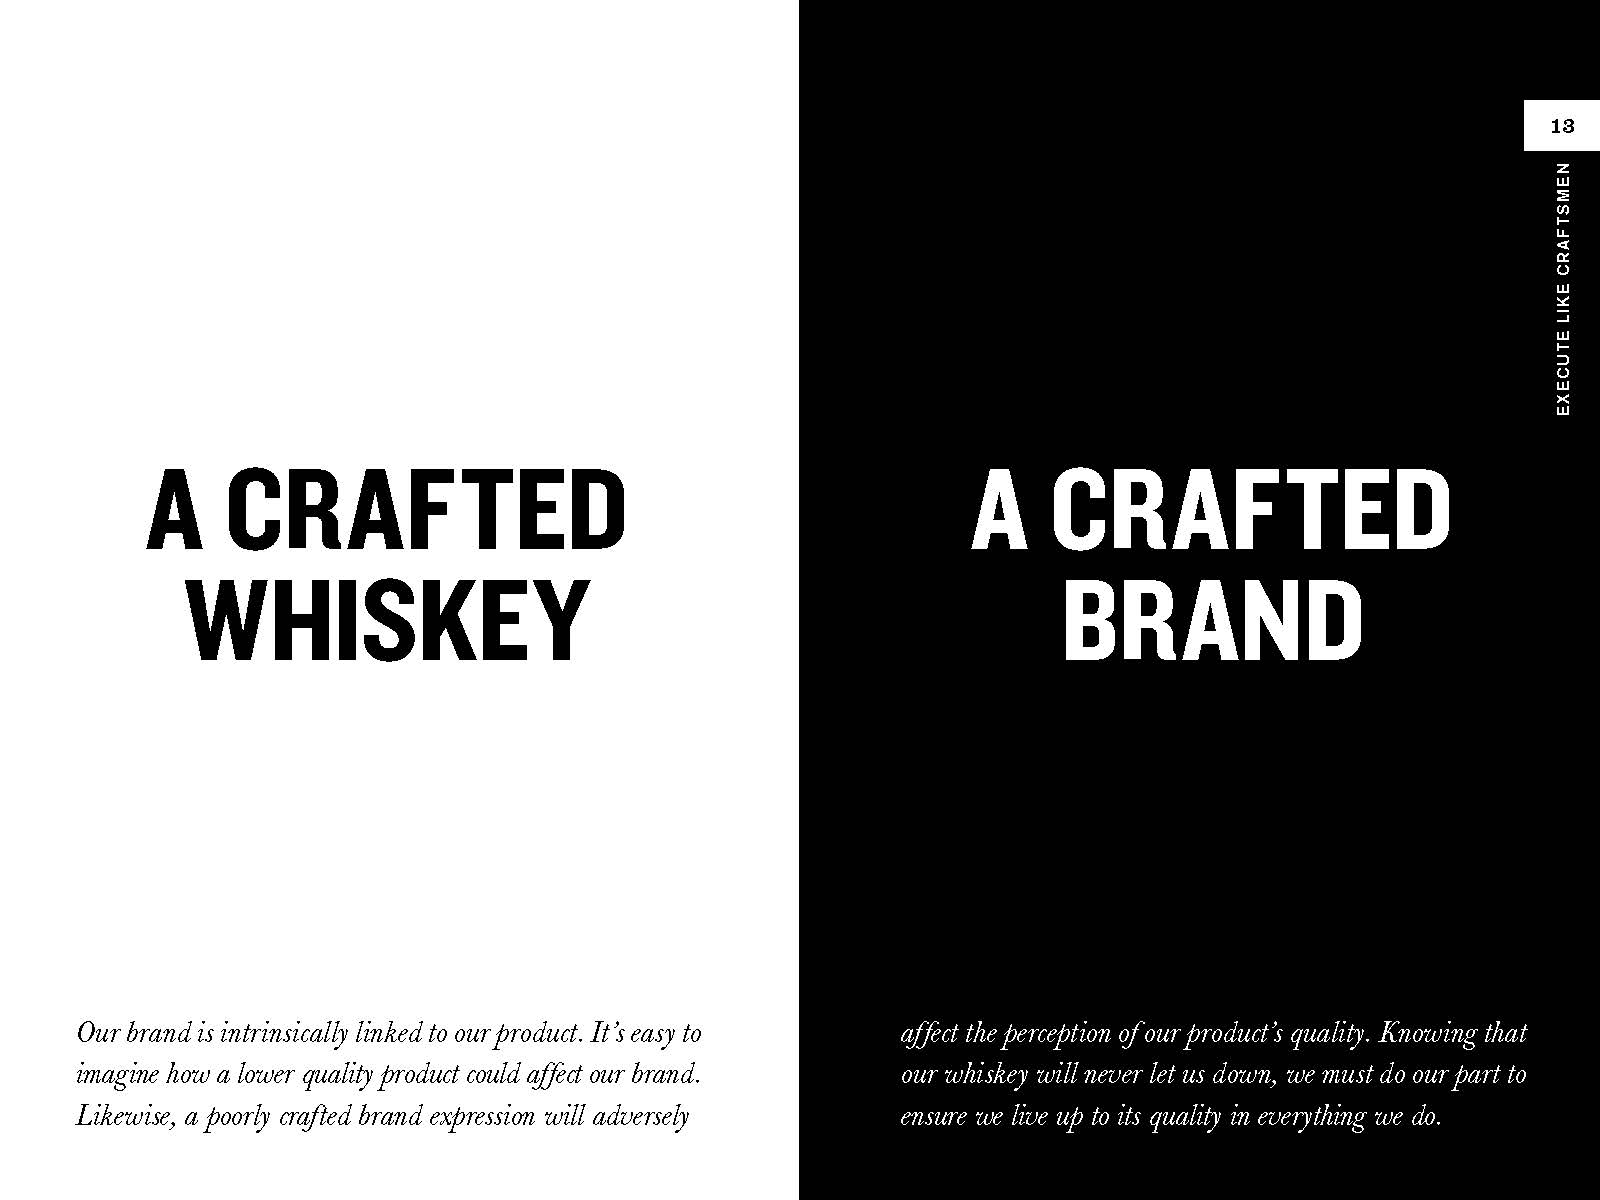 Jack Daniel's Guiding Principles 2012_Page_10.jpg